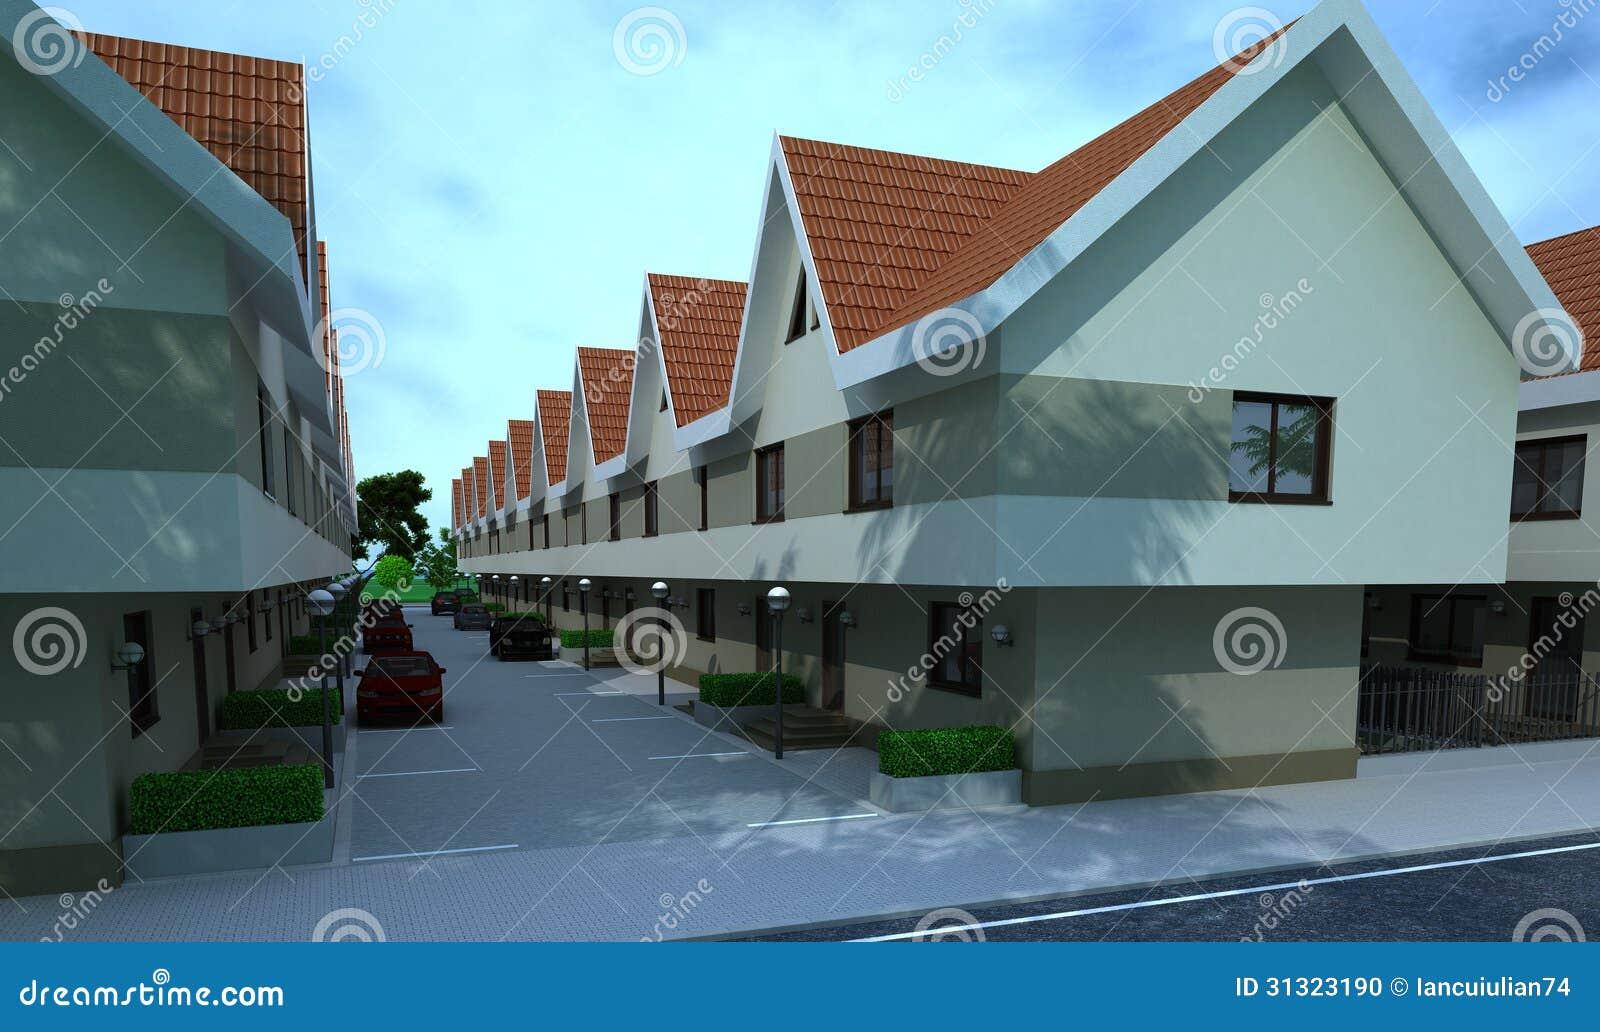 Exterior building design rendering architecture stock for Exterior design of building